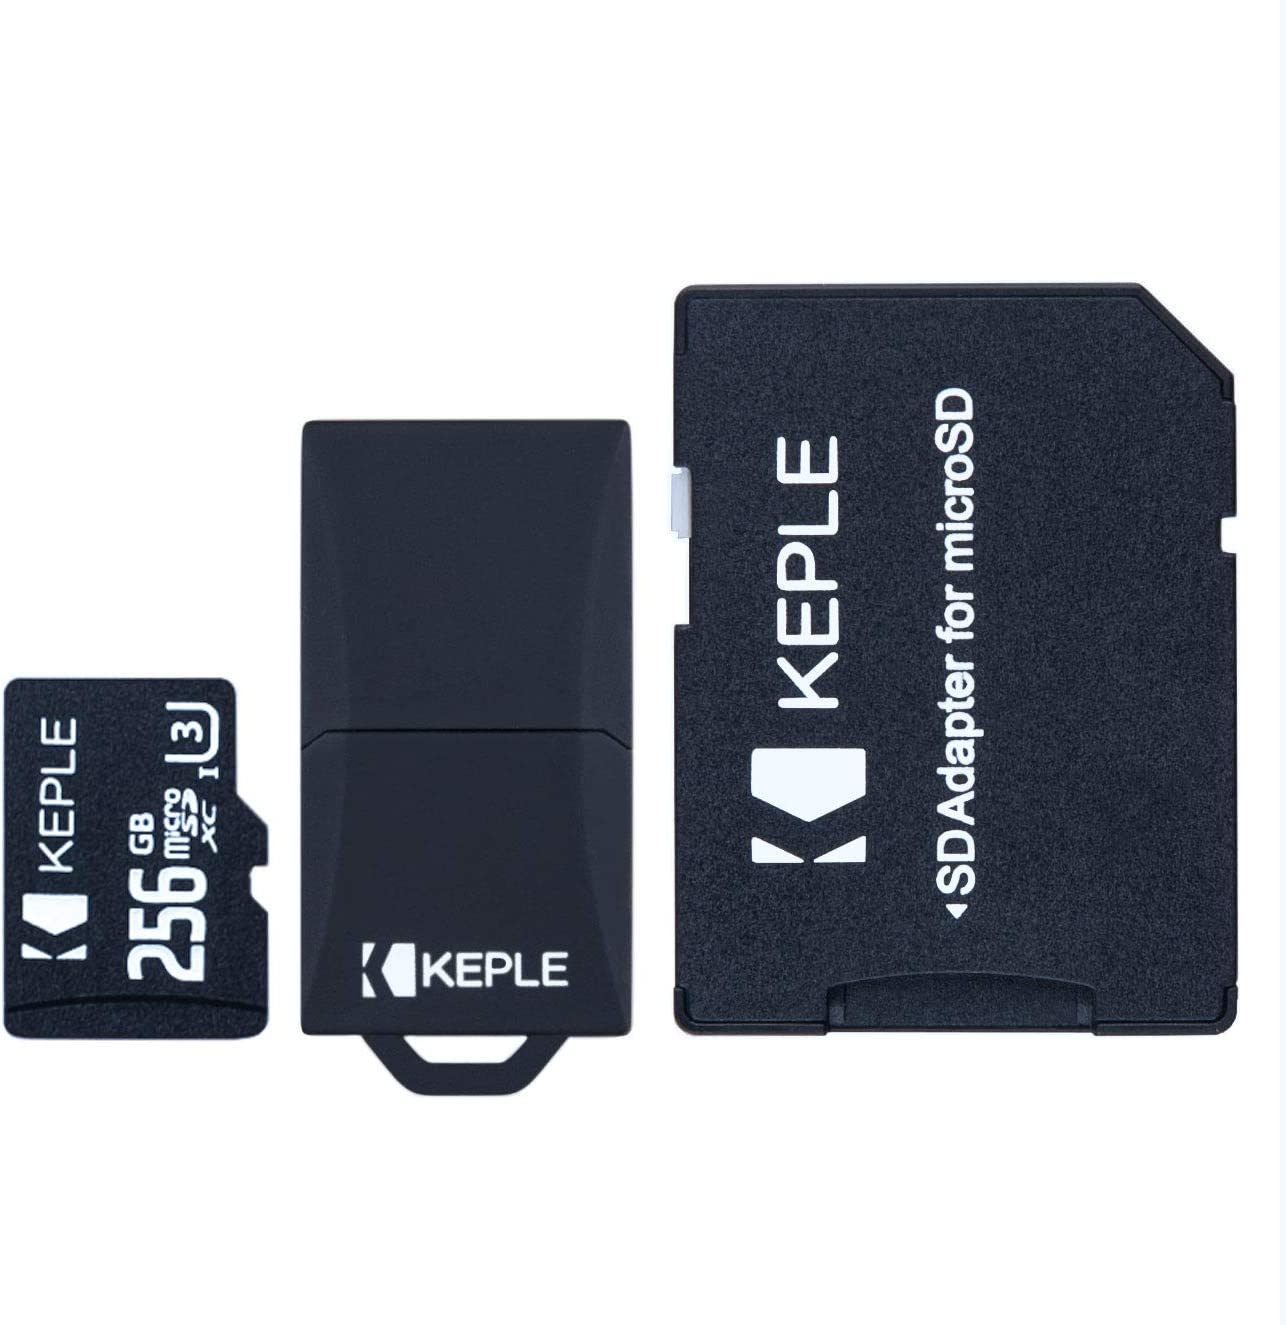 Zenfone 5z ZenFone Lite Zenfone 4 // Pro Zenfone 5 // Lite Zenfone V 256 GB Go ROG Phone ZenFone Live Carte Micro SD 256Go 256GB MicroSD Compatible avec ASUS Zenfone Max Plus//Pro//Shot